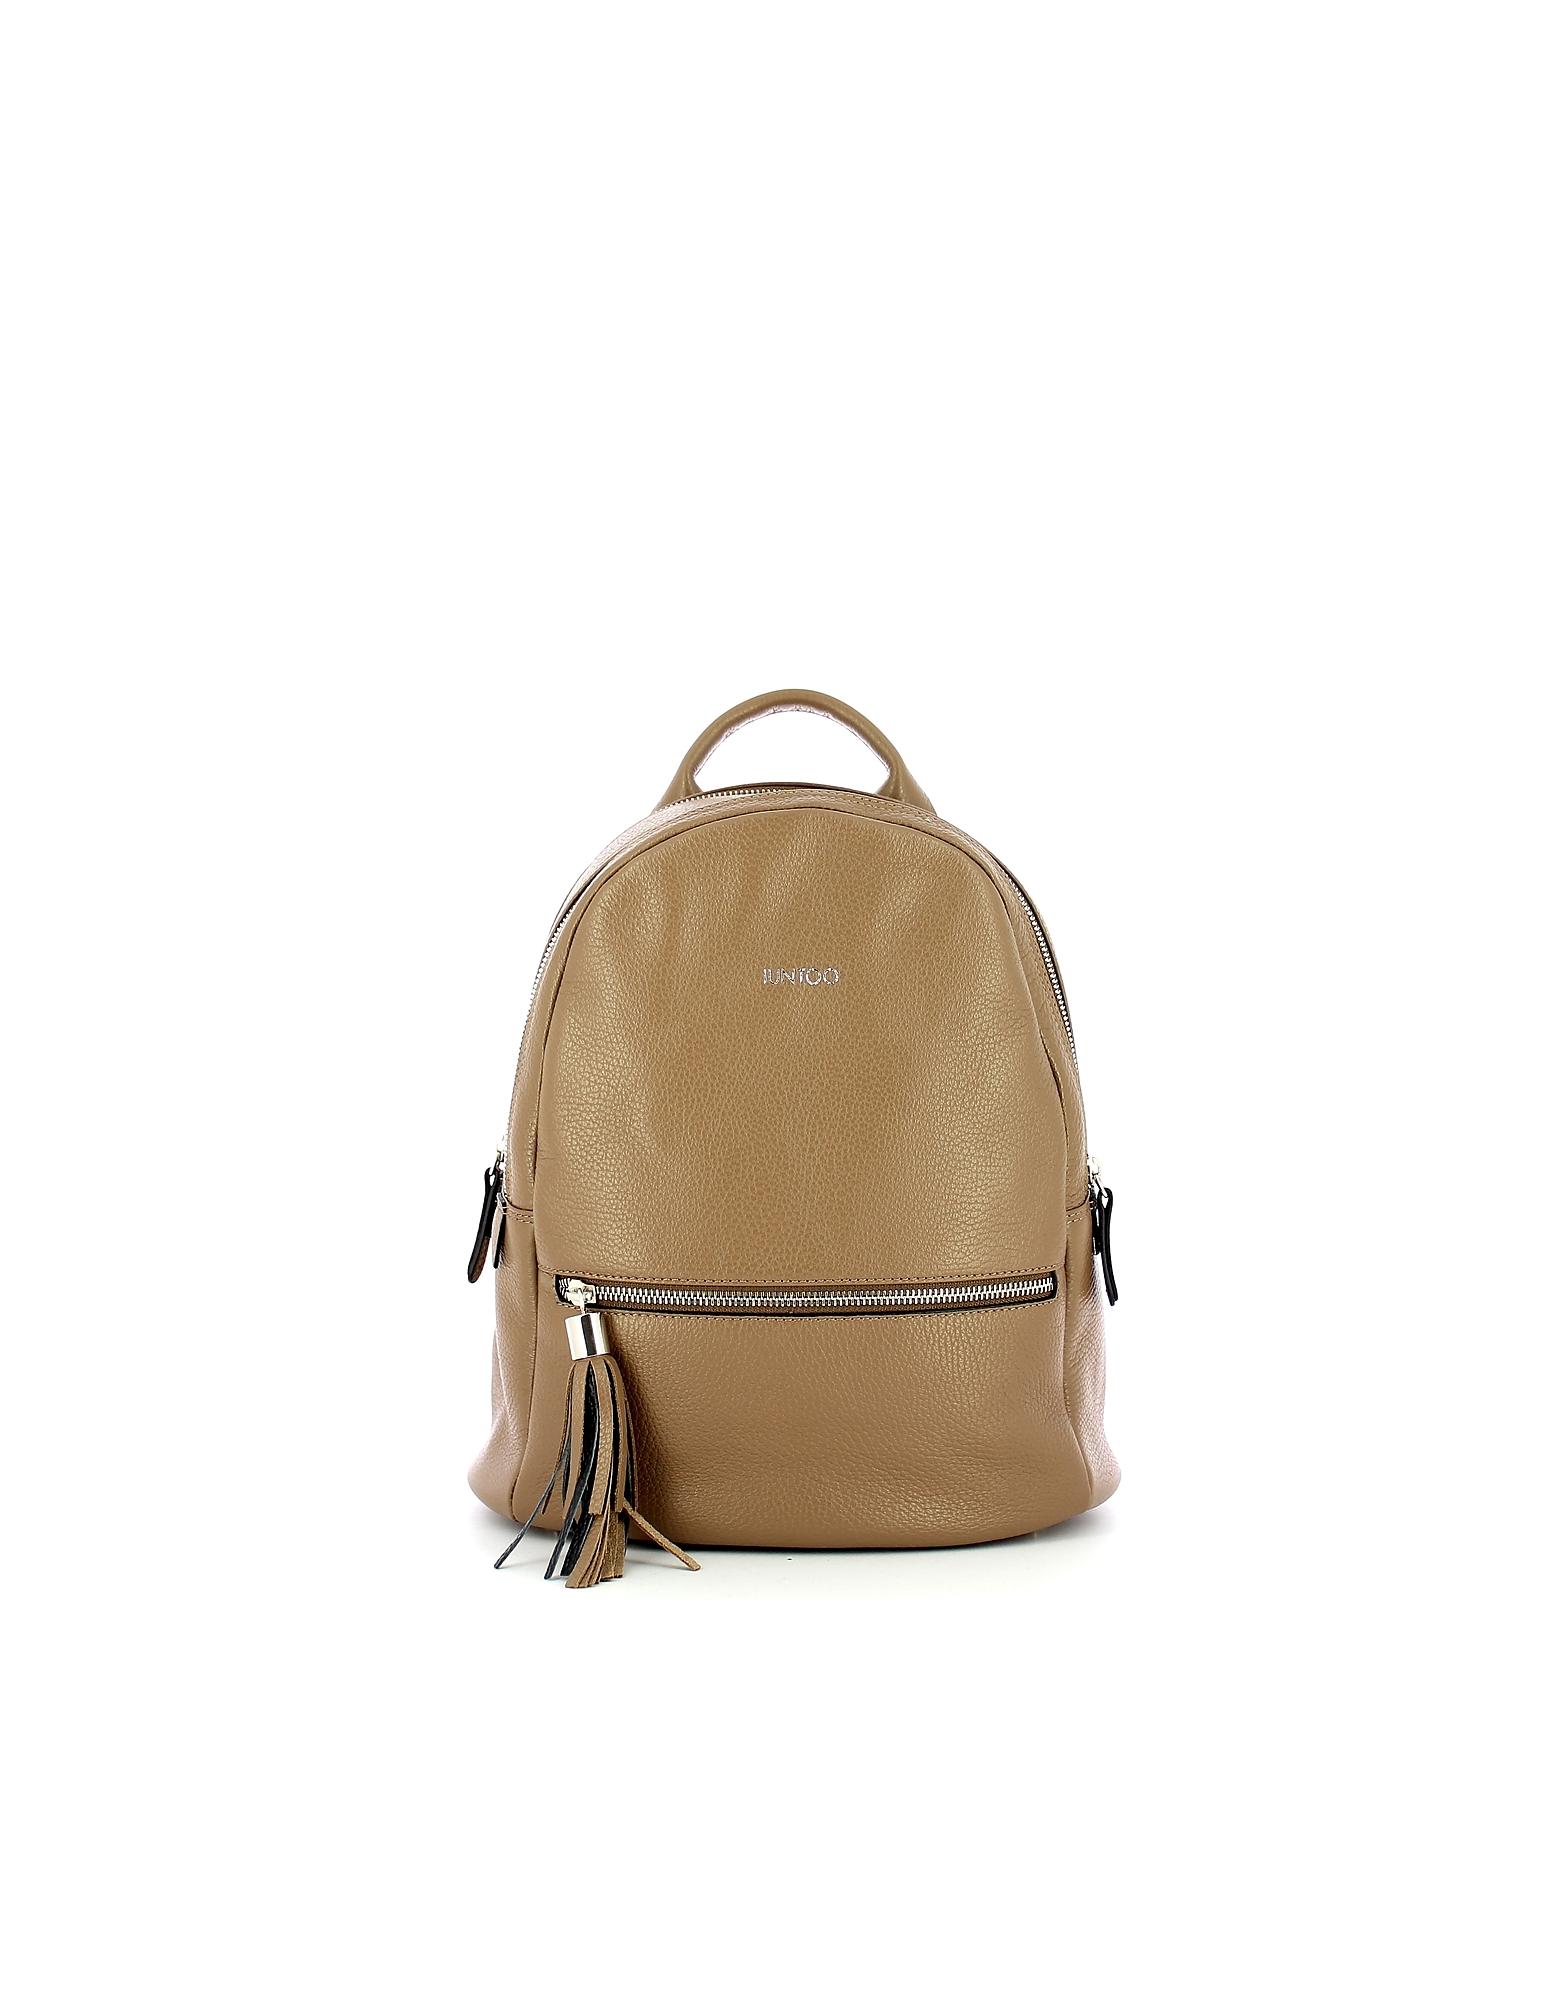 IUNTOO Designer Handbags, Beige Leather Armonia Zip Backpack